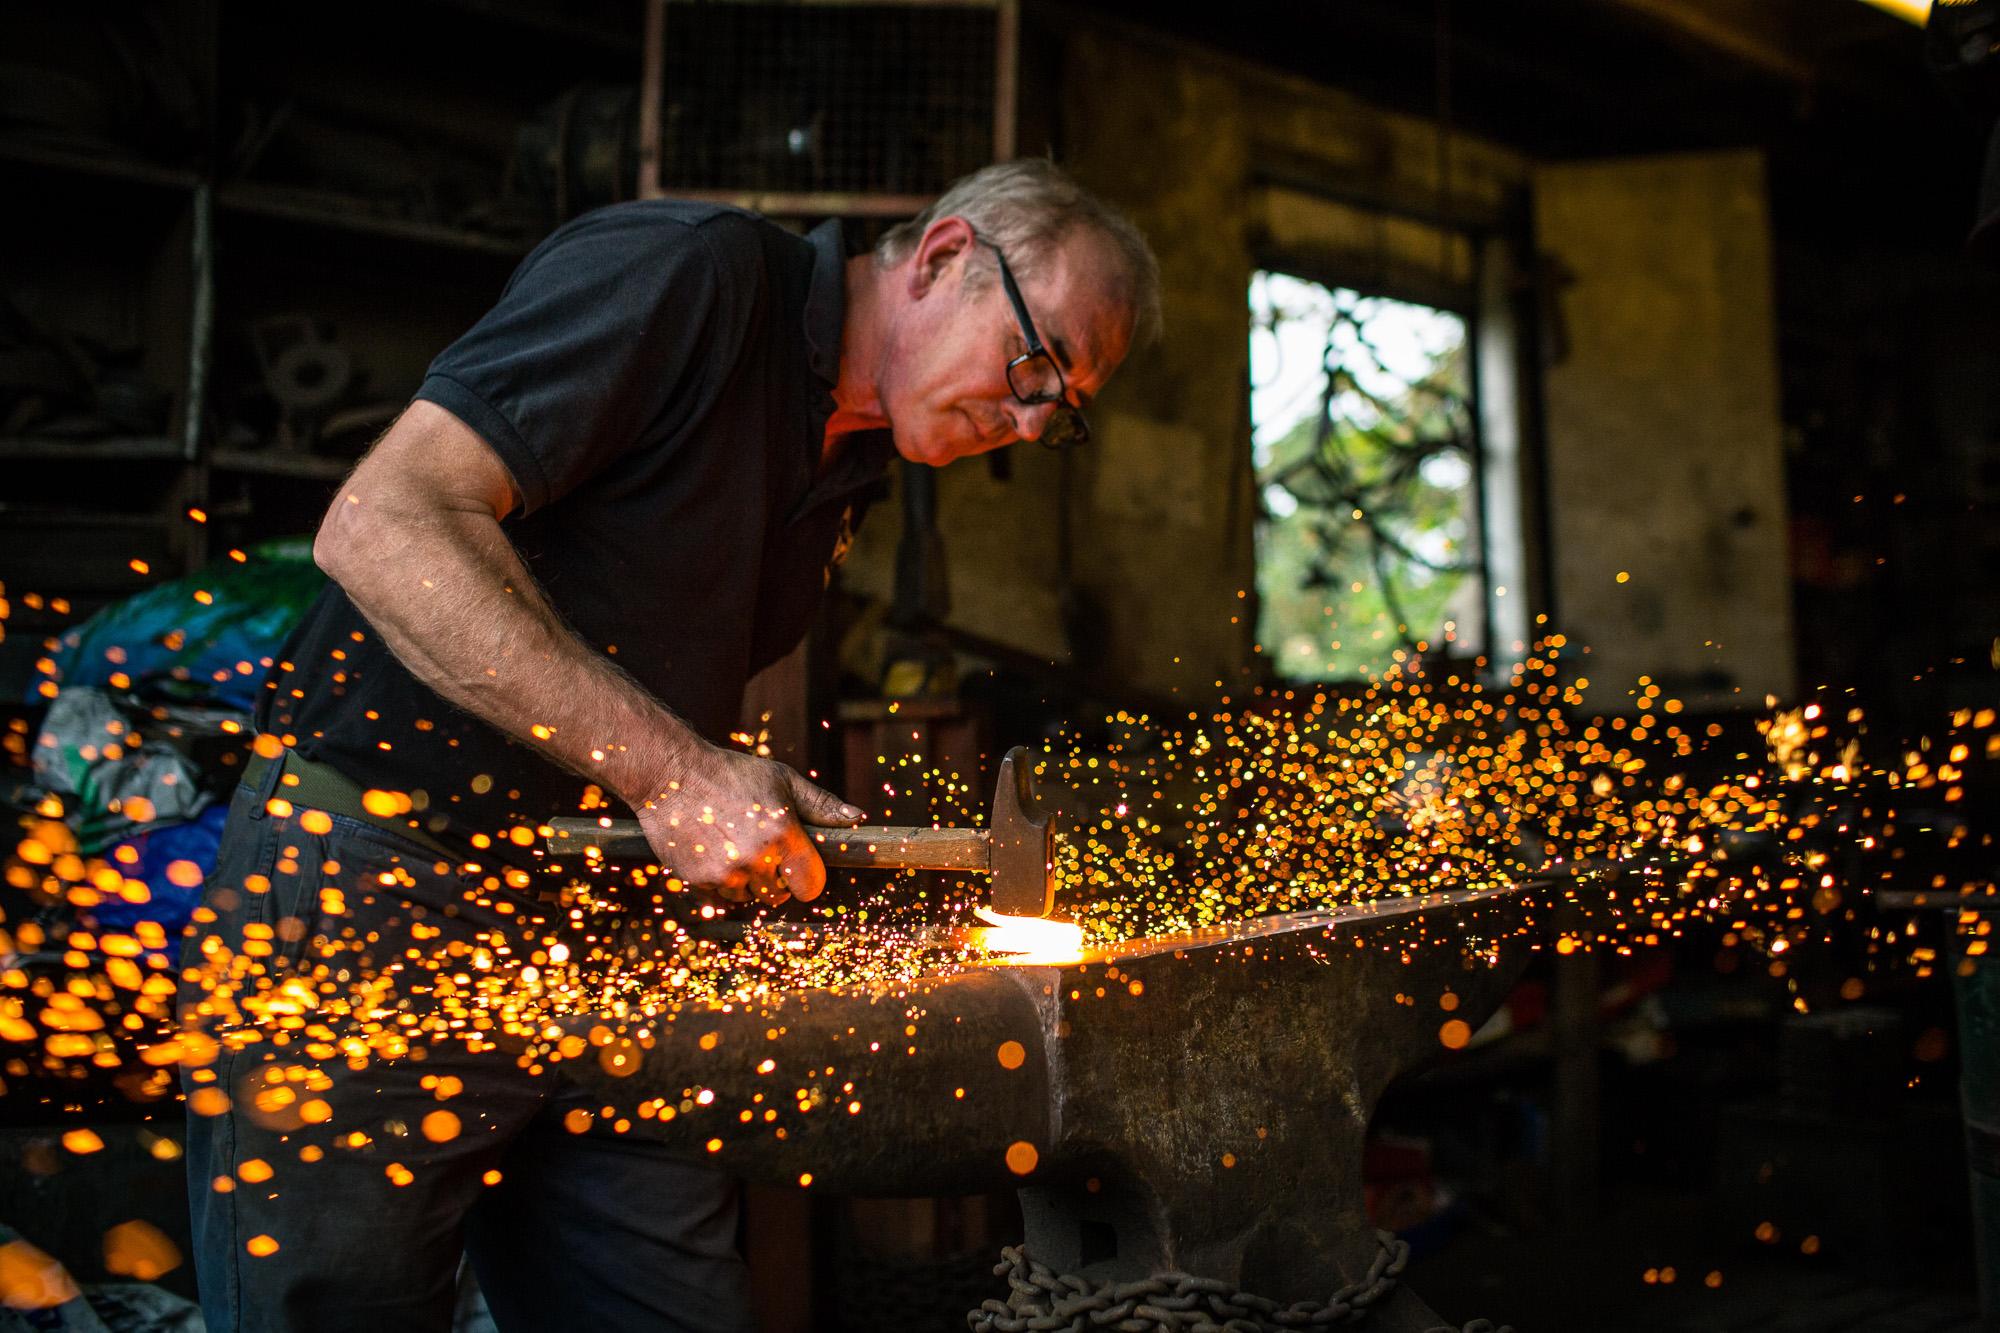 Positive News - Surrey Docks Farm Blacksmith